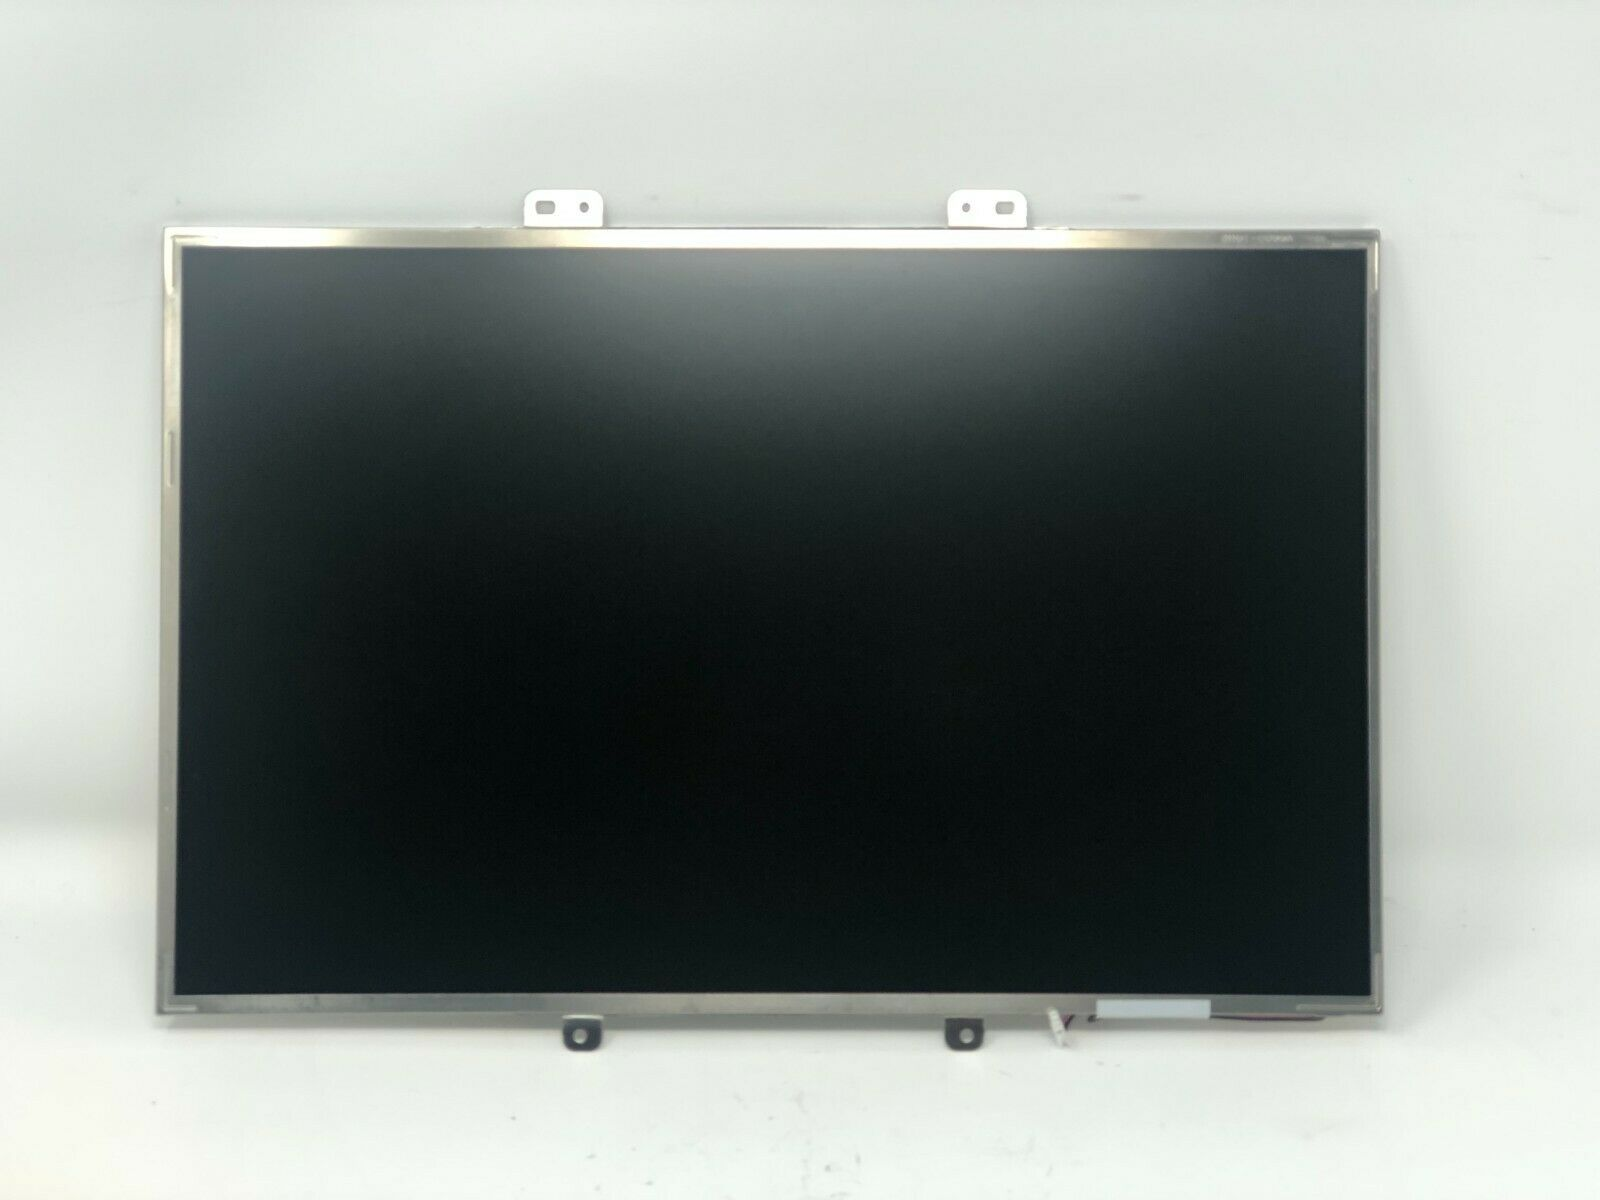 LG Philips 15.4